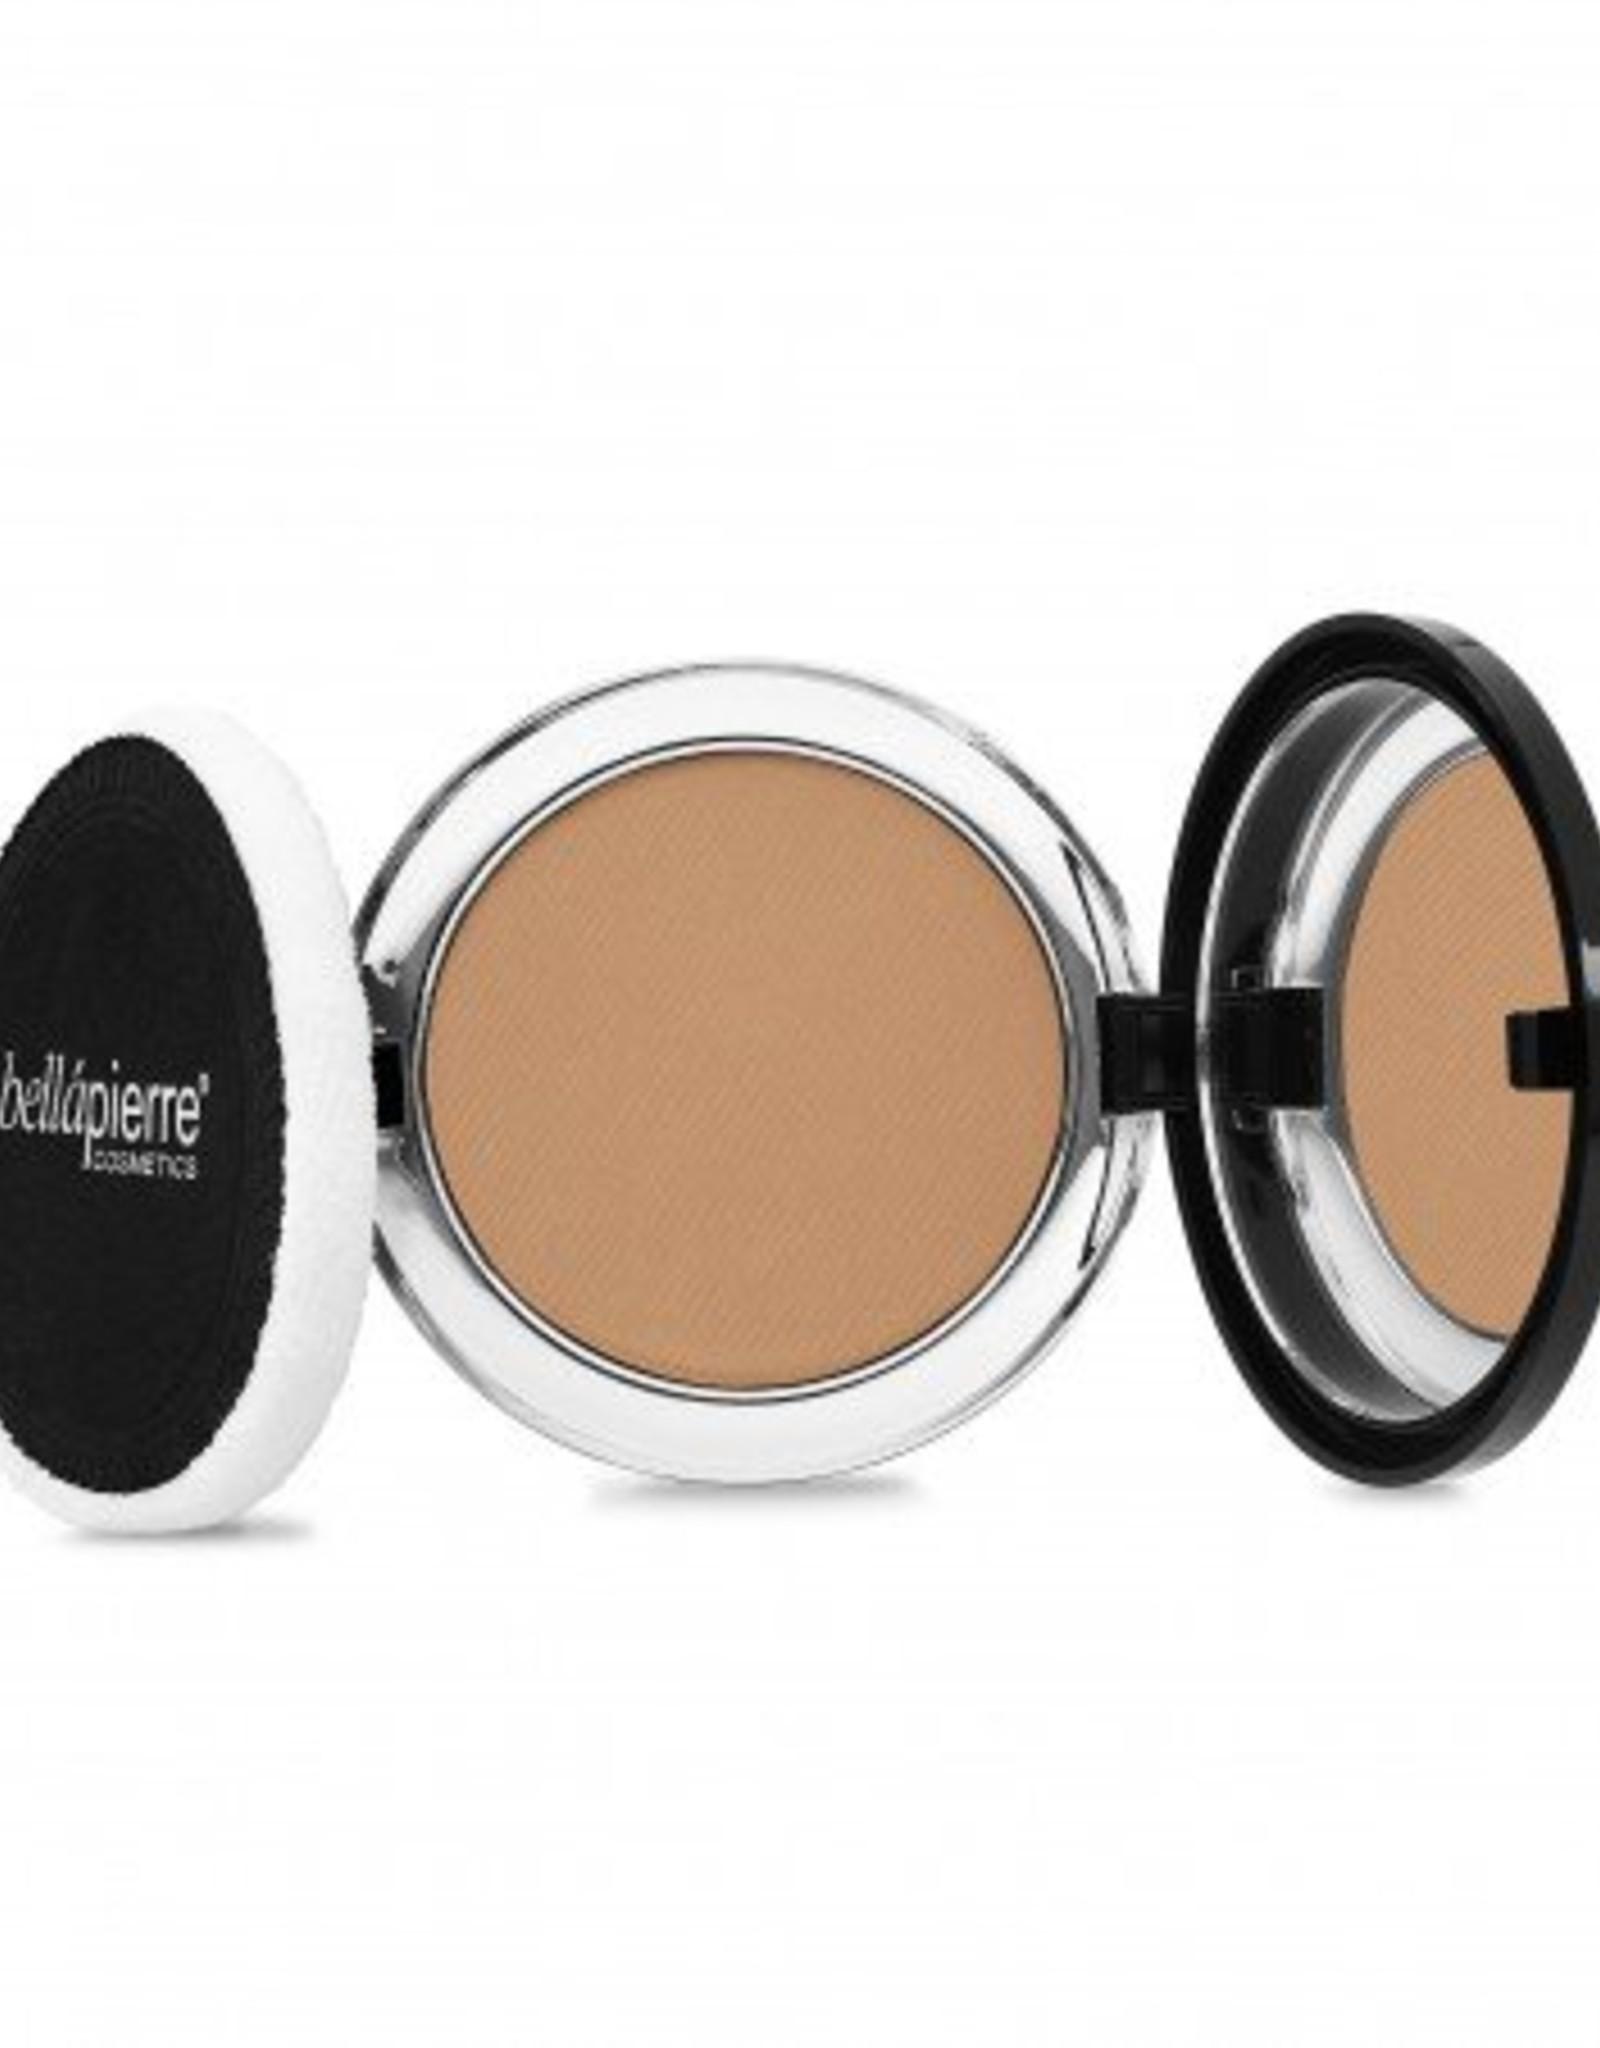 Bellápiere Bellápierre- compact foundation - Nutmeg